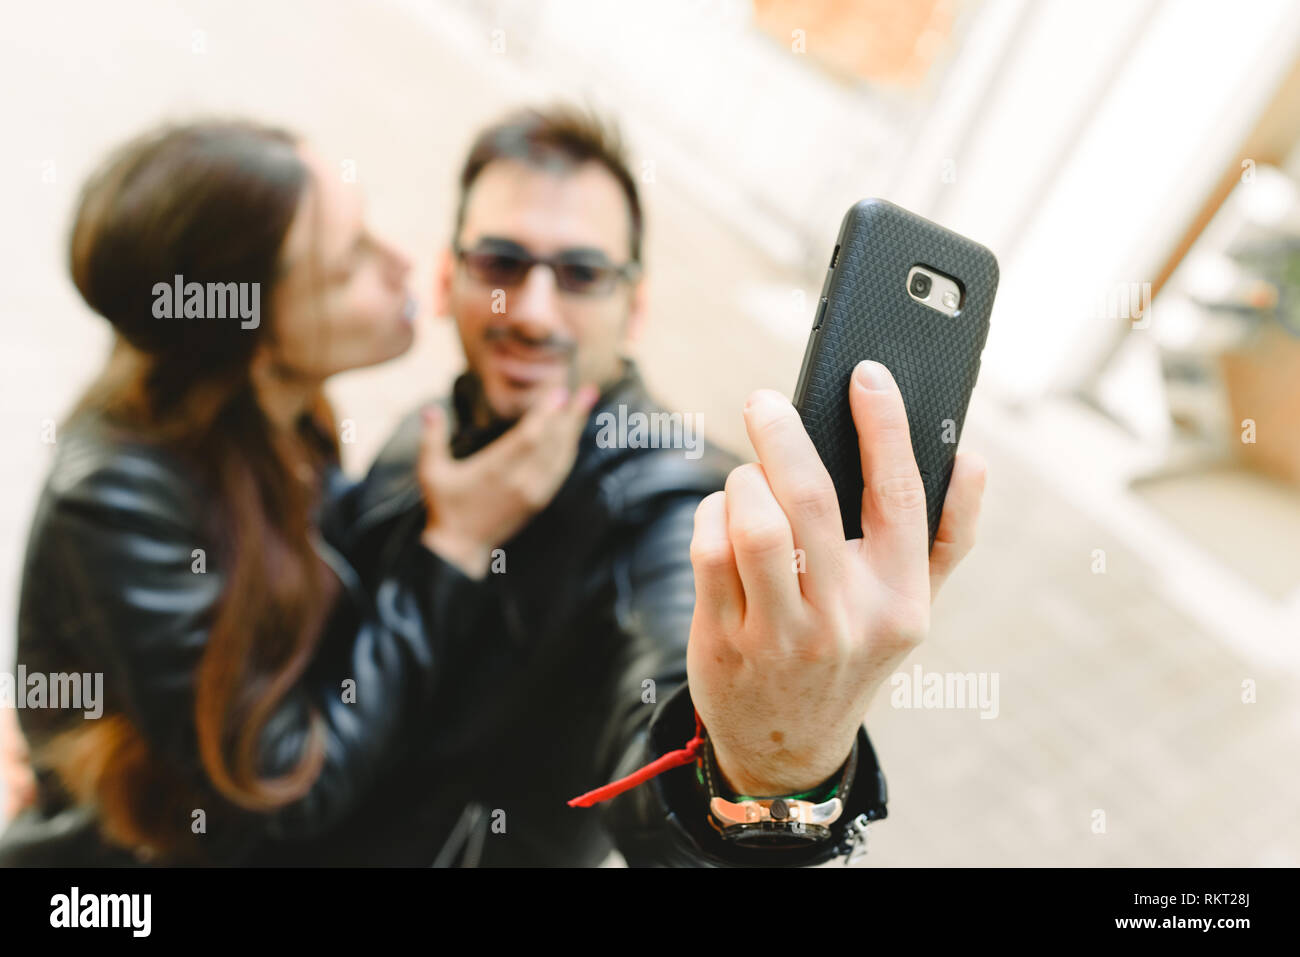 Selfi amateur Selfie: How